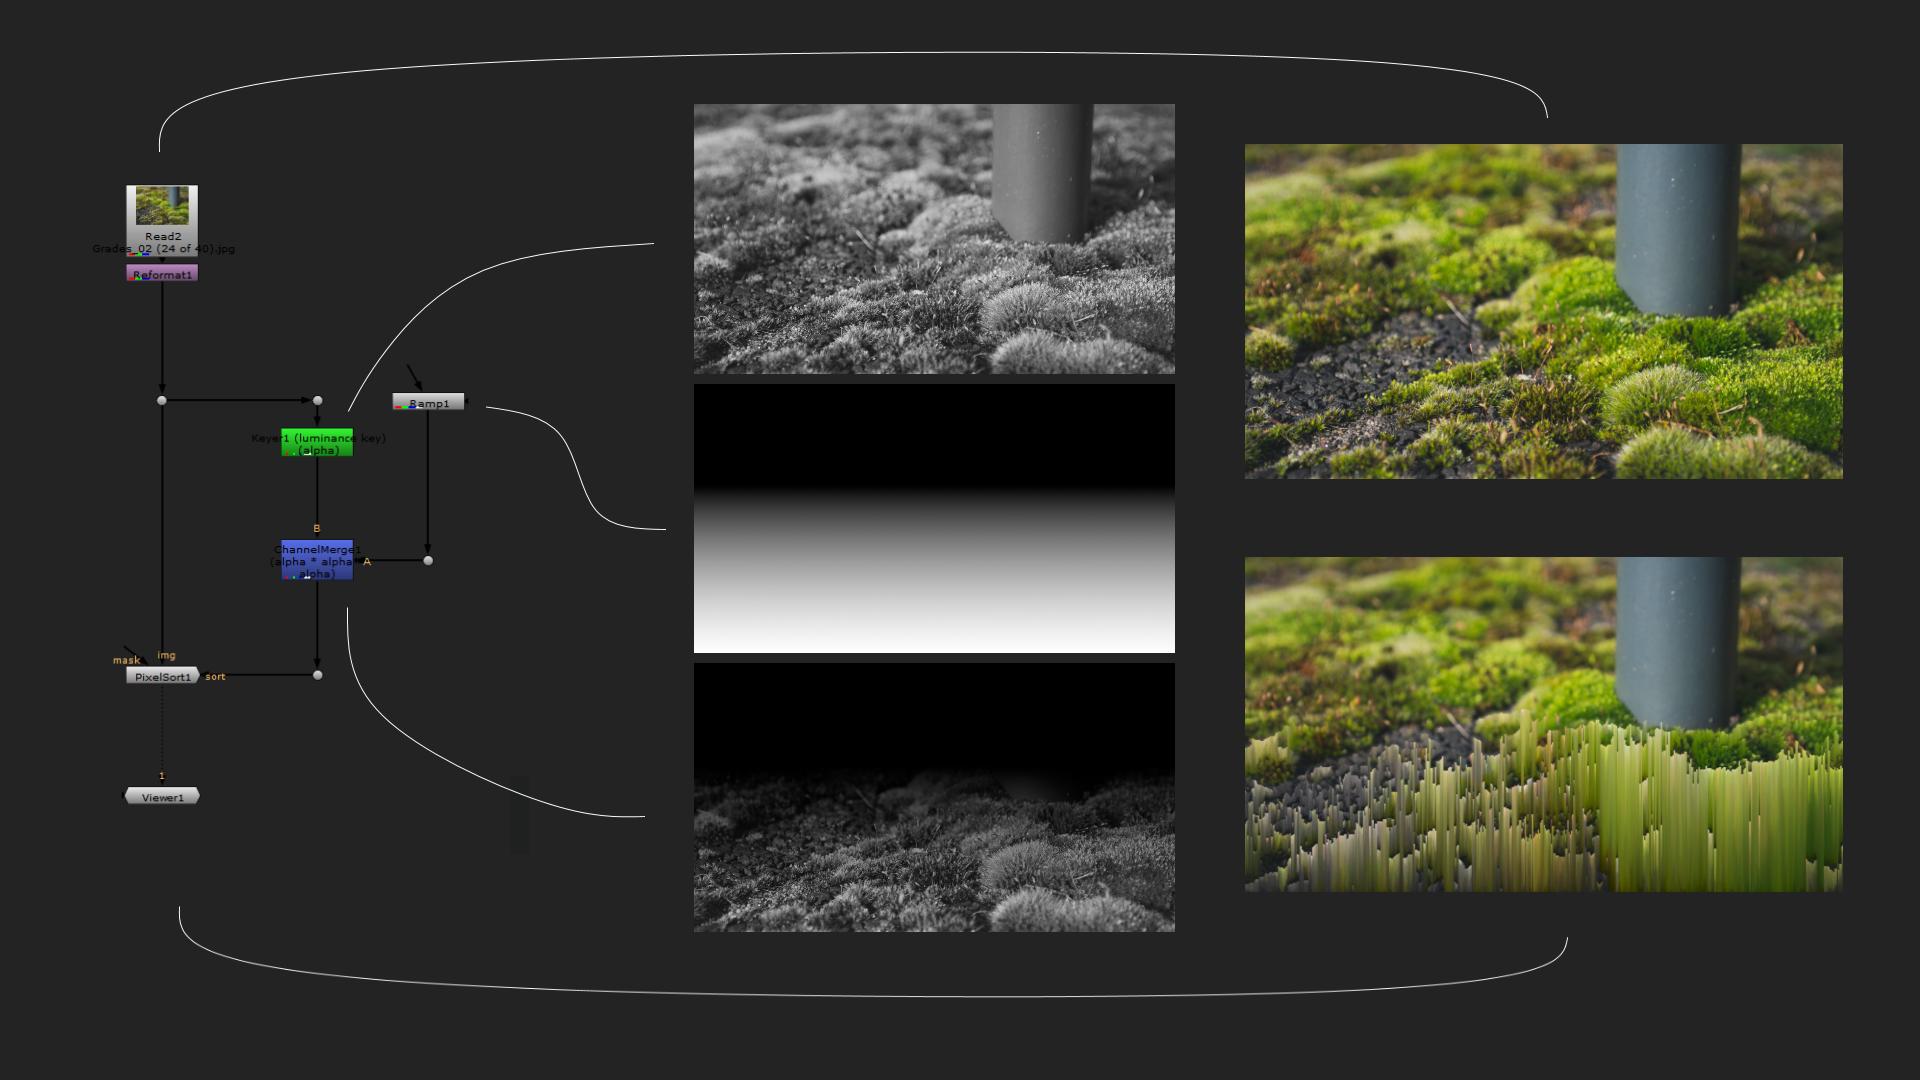 nuke pixelsorting example